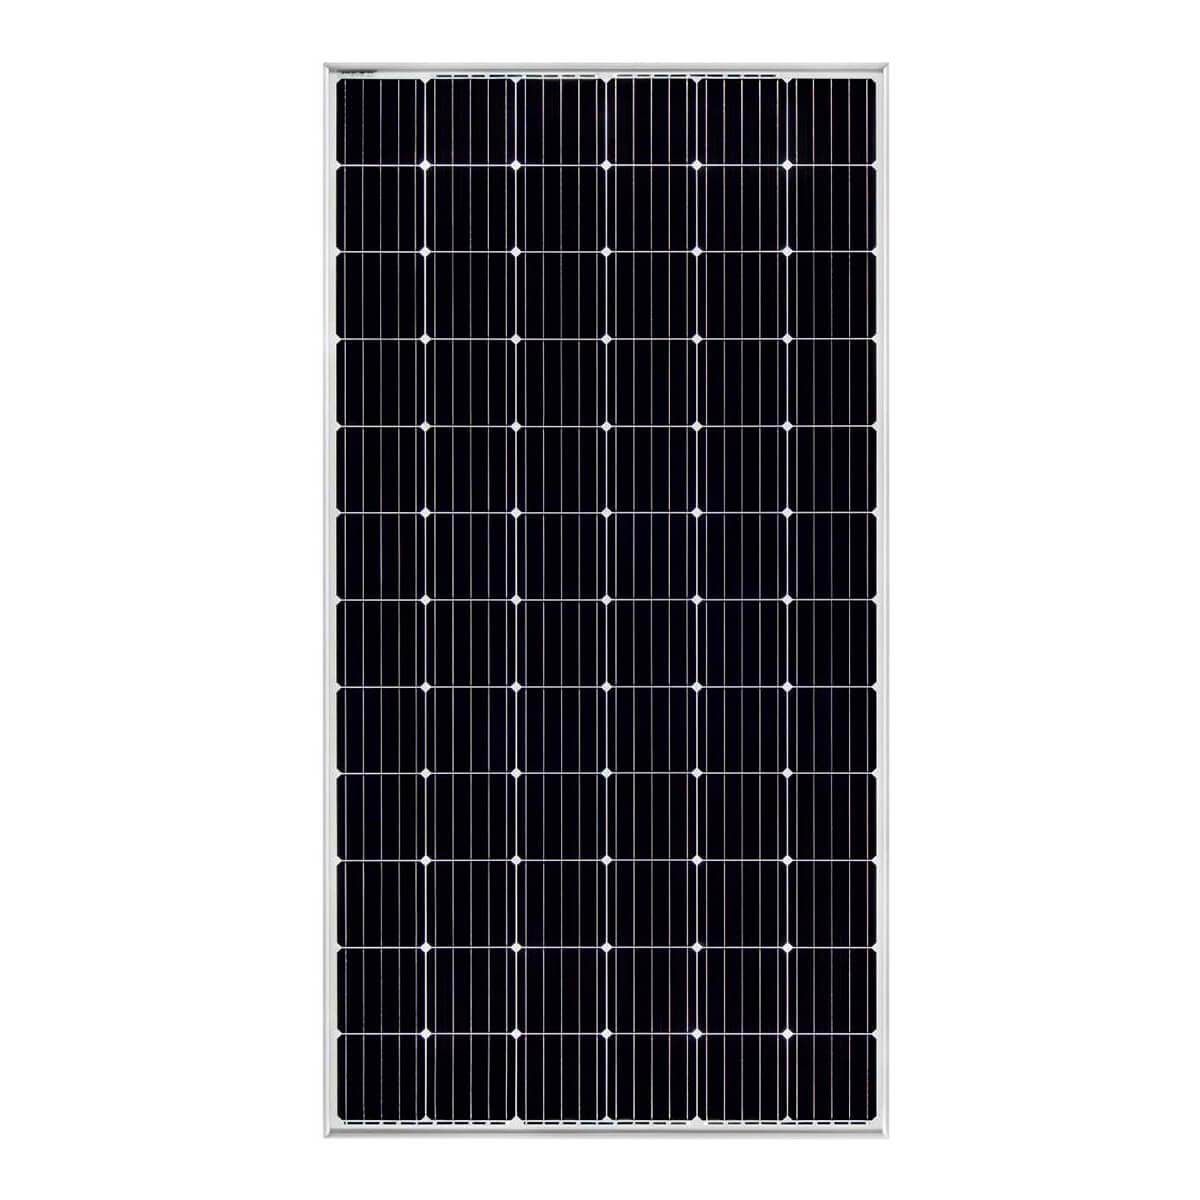 Odul solar 370W panel, odul solar 370Watt panel, Odul solar 370 W panel, odul solar 370 Watt panel, odul solar 370 Watt monokristal panel, Odul solar 370 W watt gunes paneli, odul solar 370 W watt monokristal gunes paneli, odul solar 370 W Watt fotovoltaik monokristal solar panel, odul solar 370W monokristal gunes enerjisi, odul solar OSM72-370W panel, ÖDÜL SOLAR 370 WATT